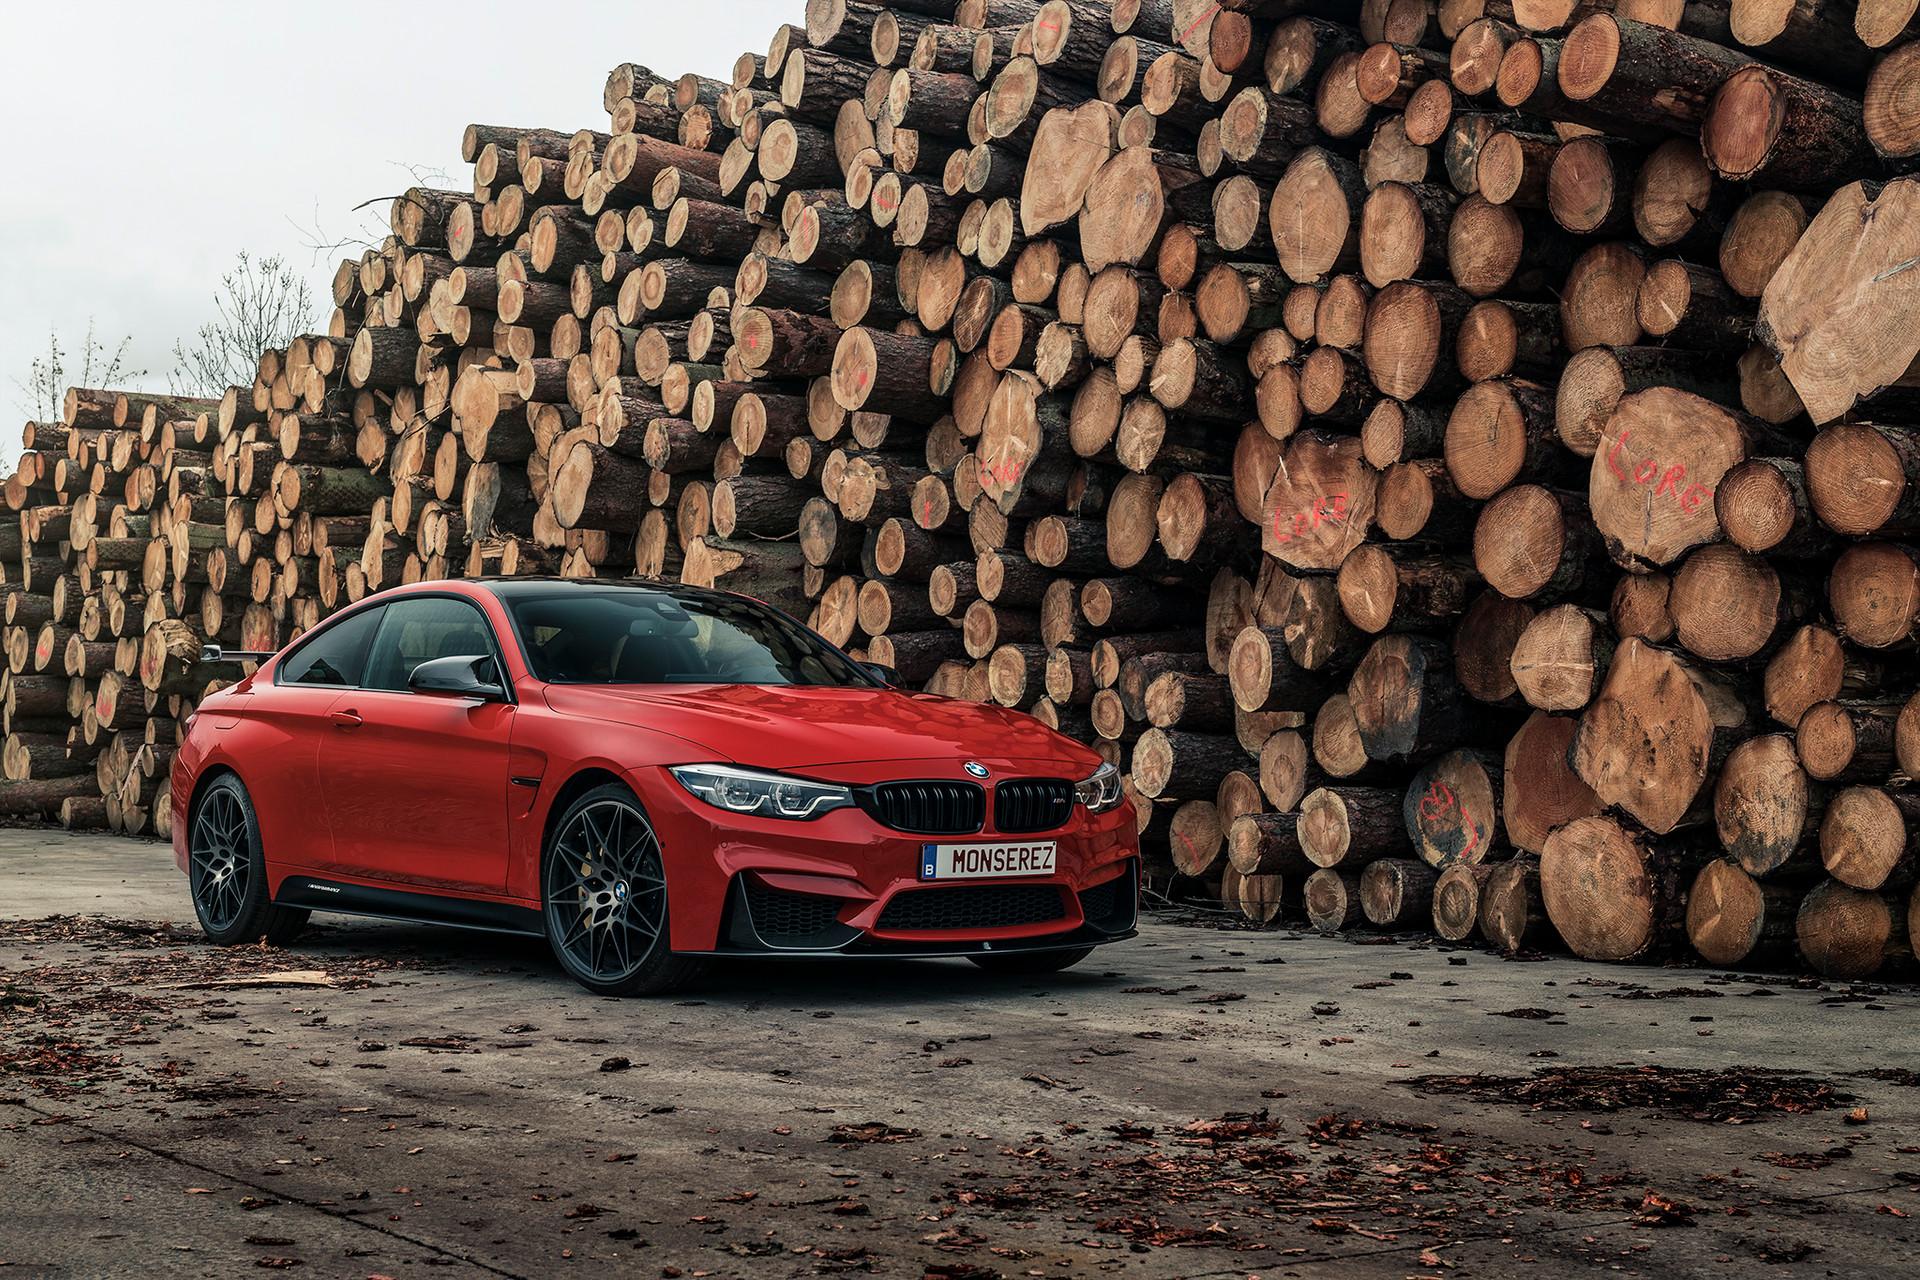 BMW M4 Ferrari red Individual